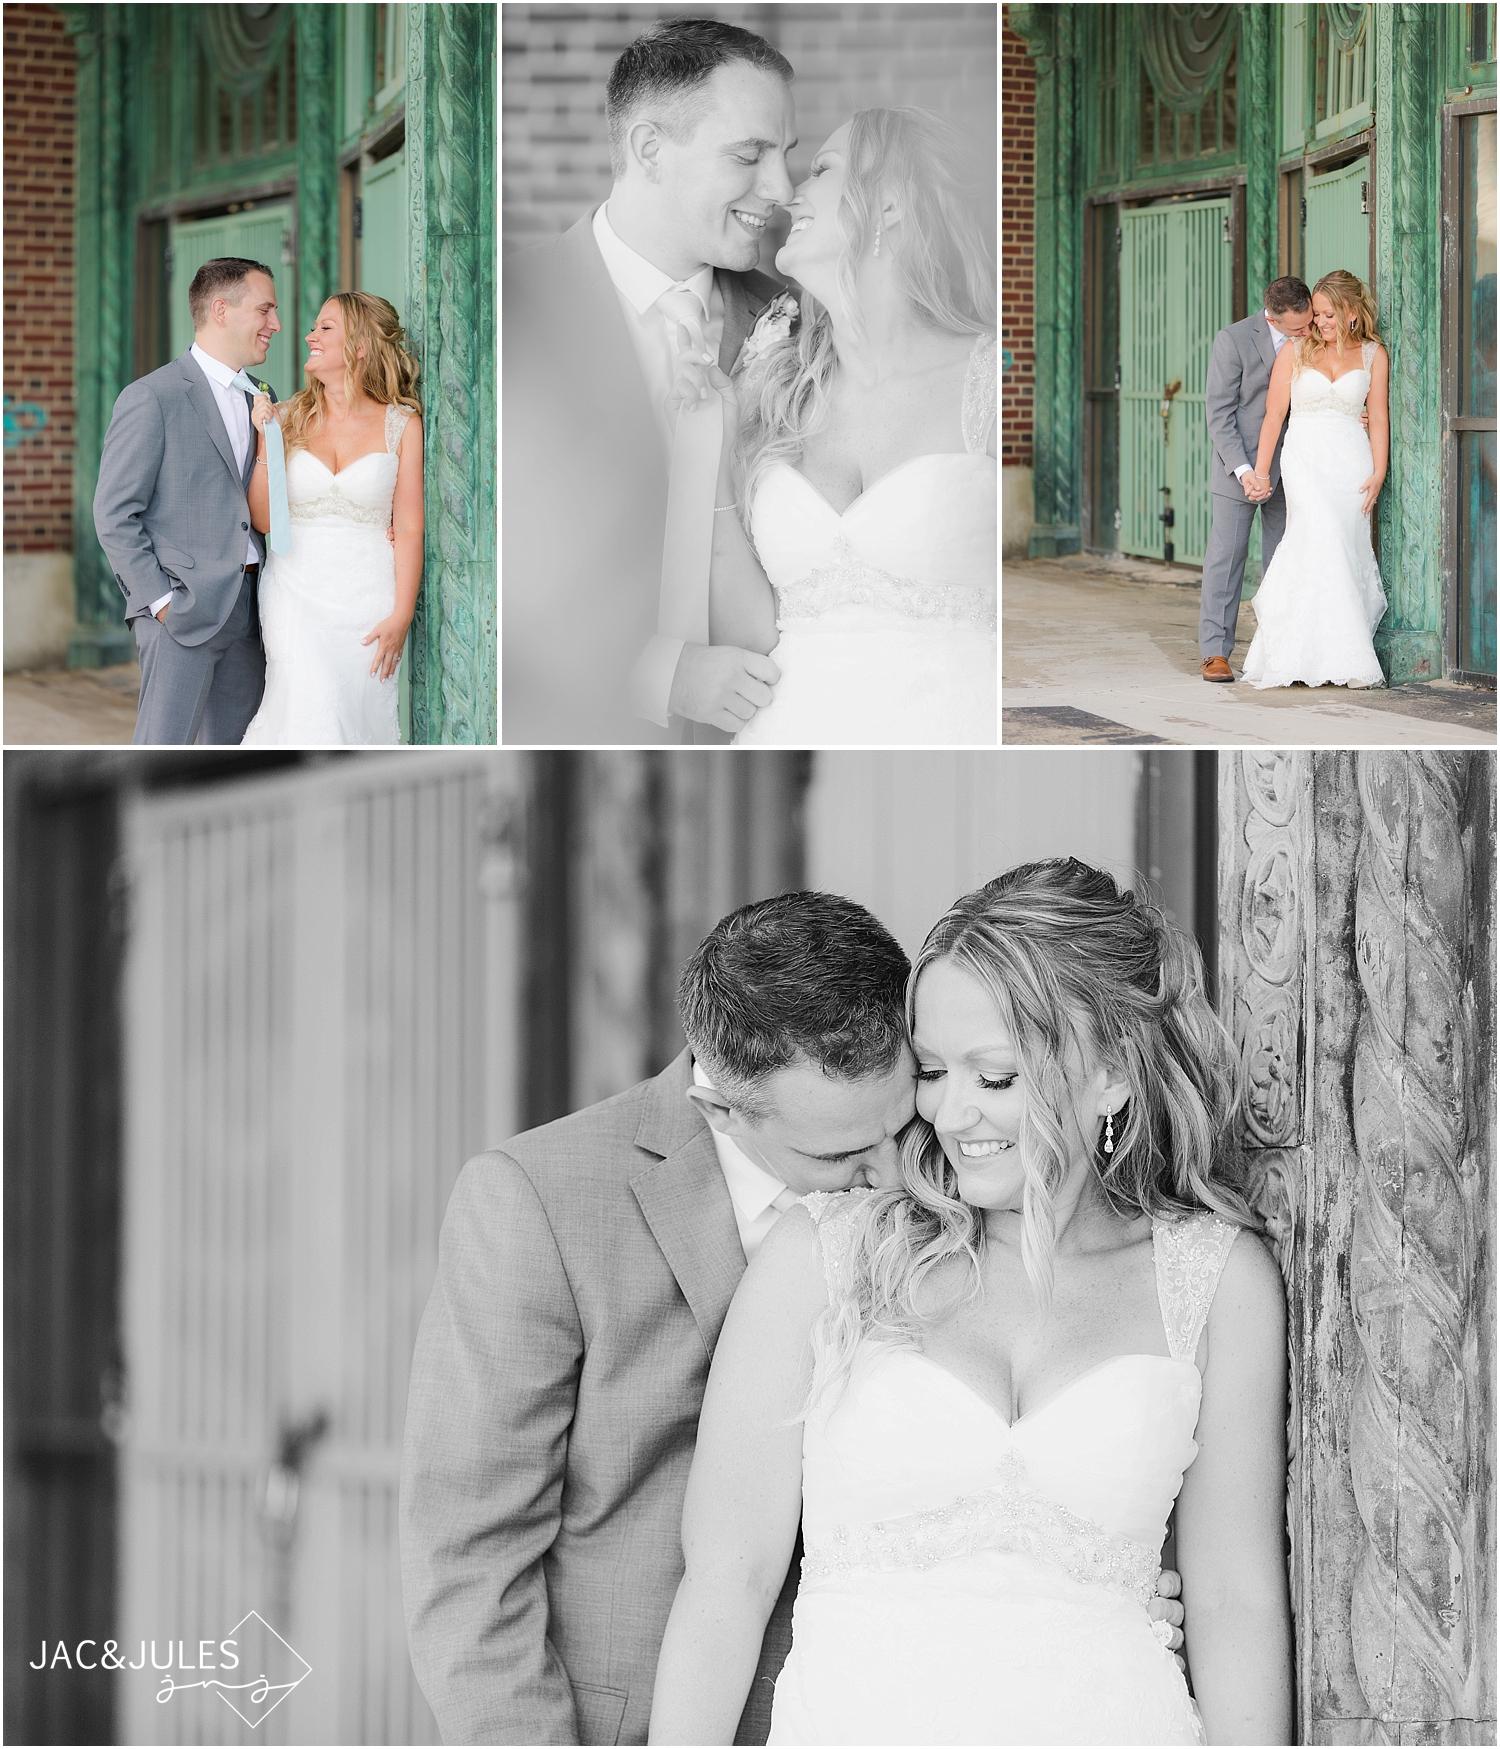 jacnjules photographs beautiful bride and groom in asbury park, nj